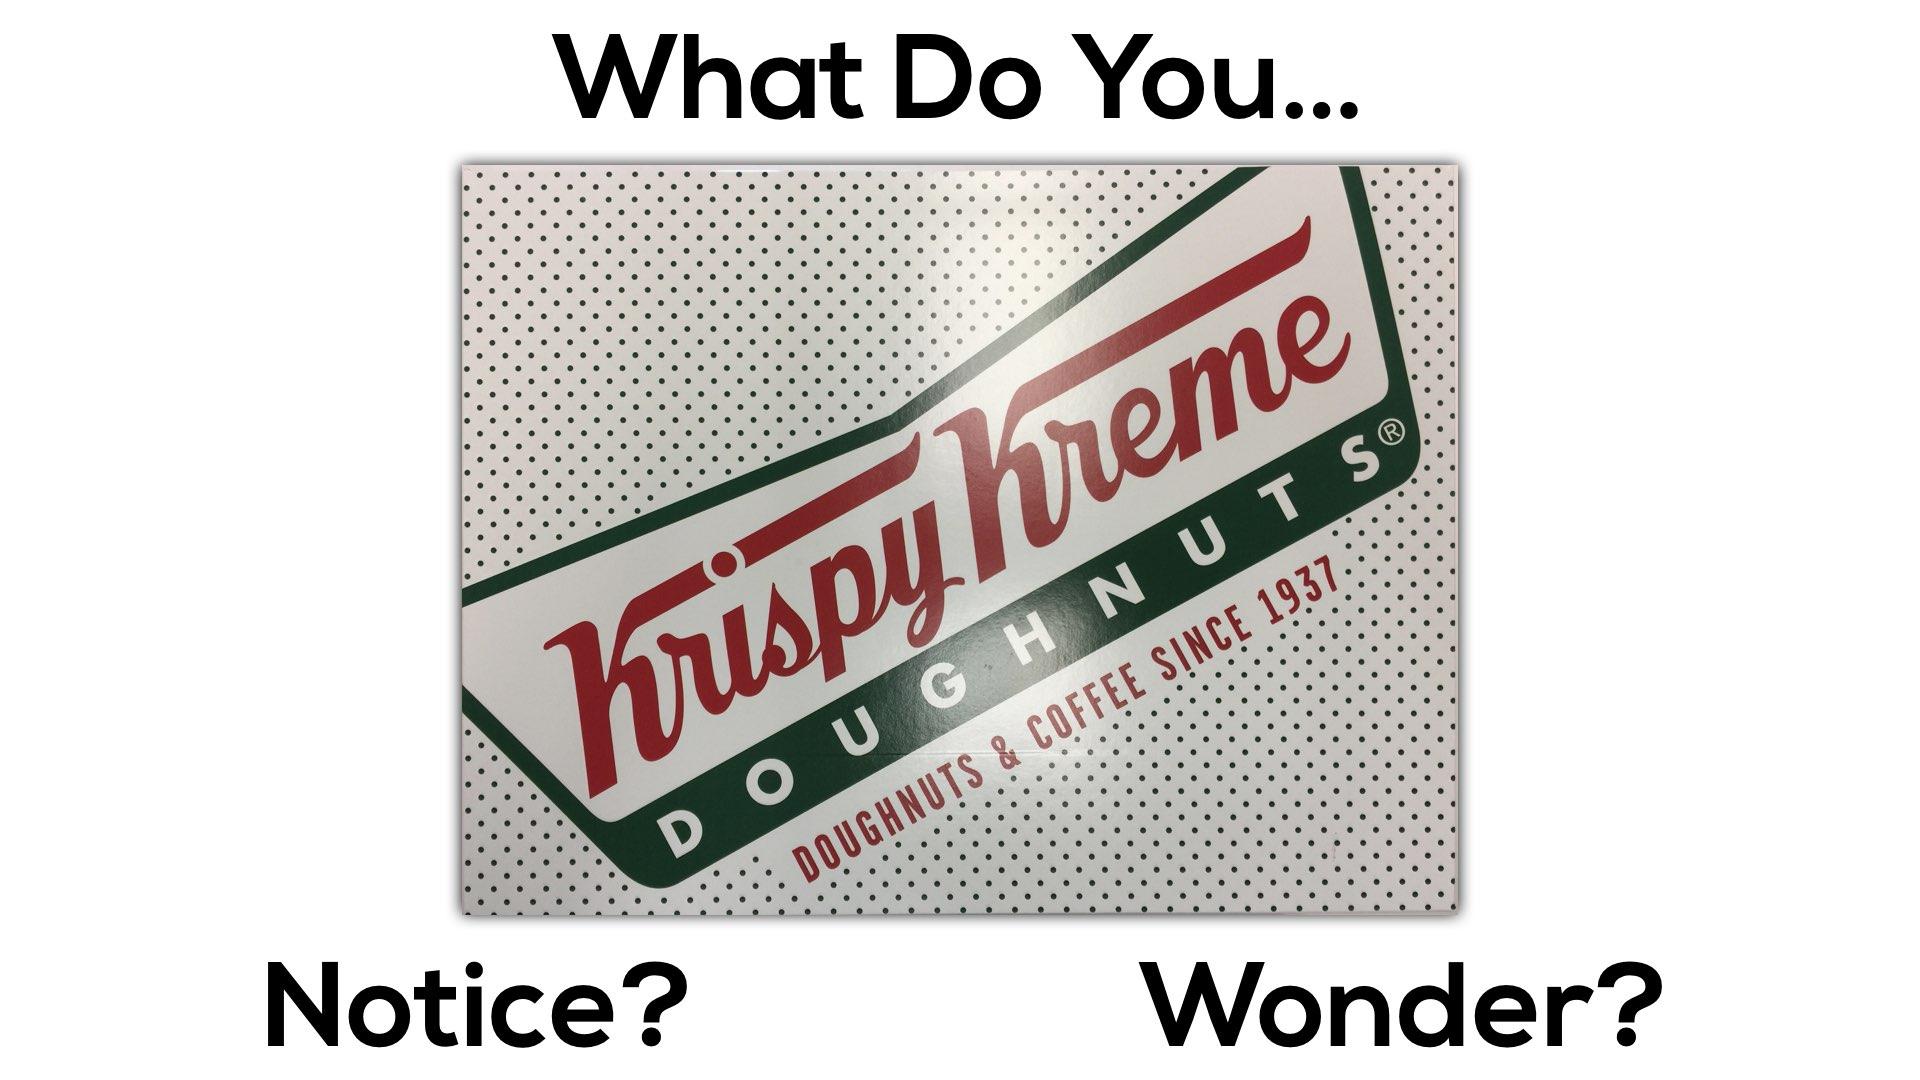 Krispy Kreme Donut Delight 3 Act Math Task   Progressions of